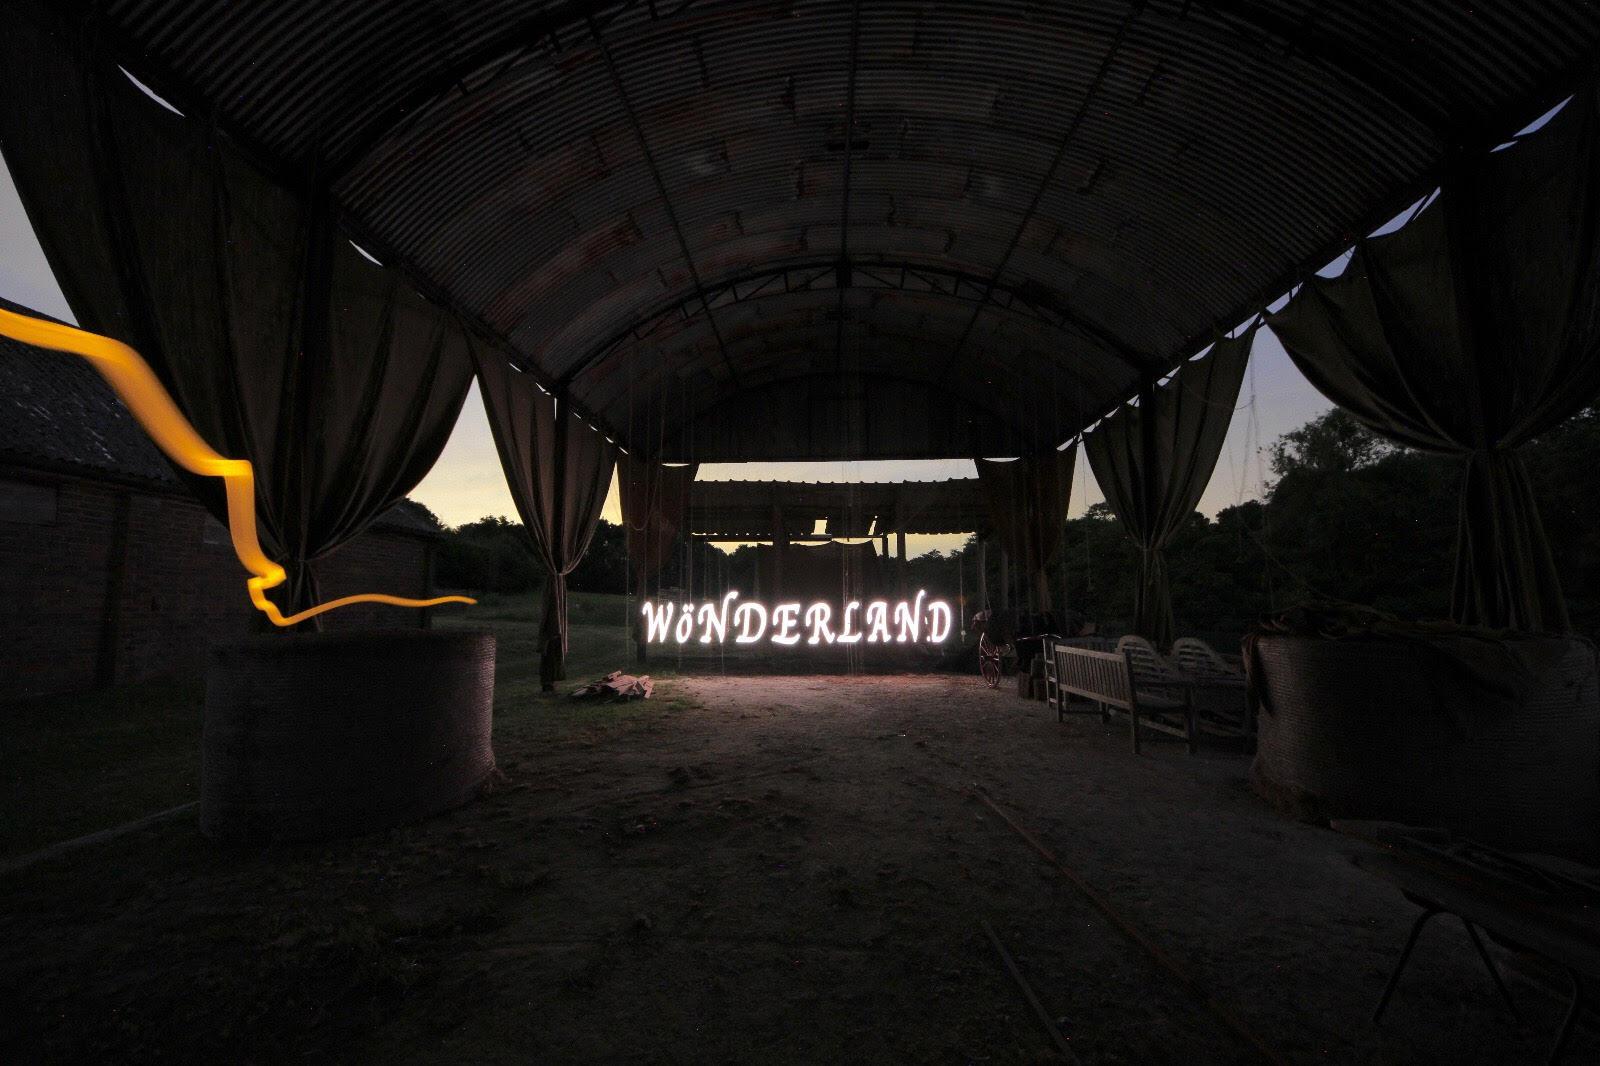 Wonderland pic.jpg